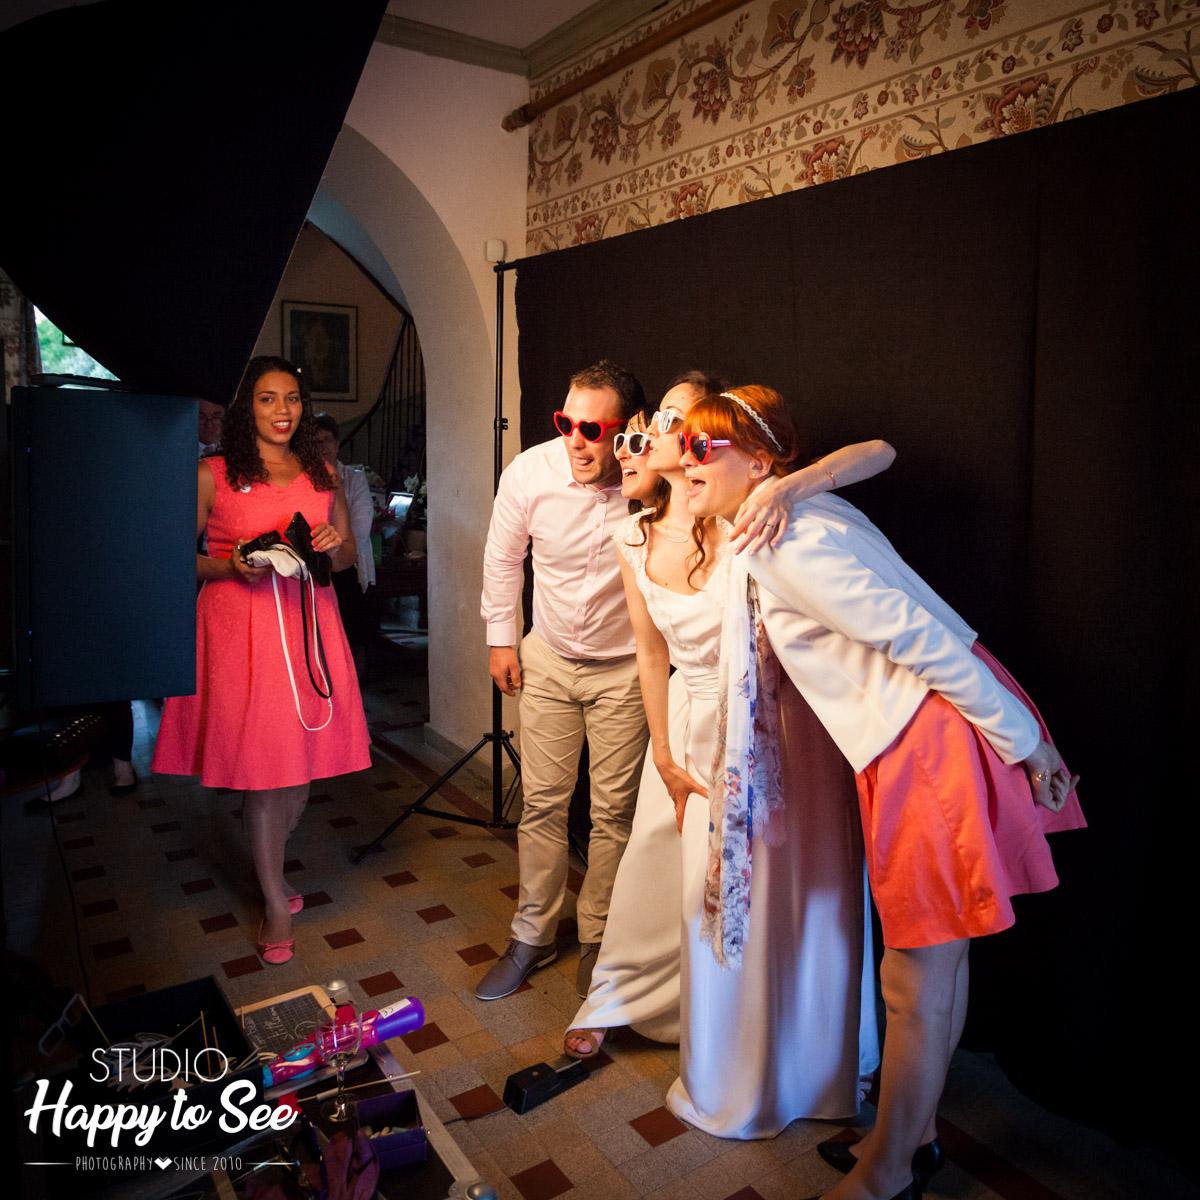 Photobooth mariage Toulouse Haute Garonne